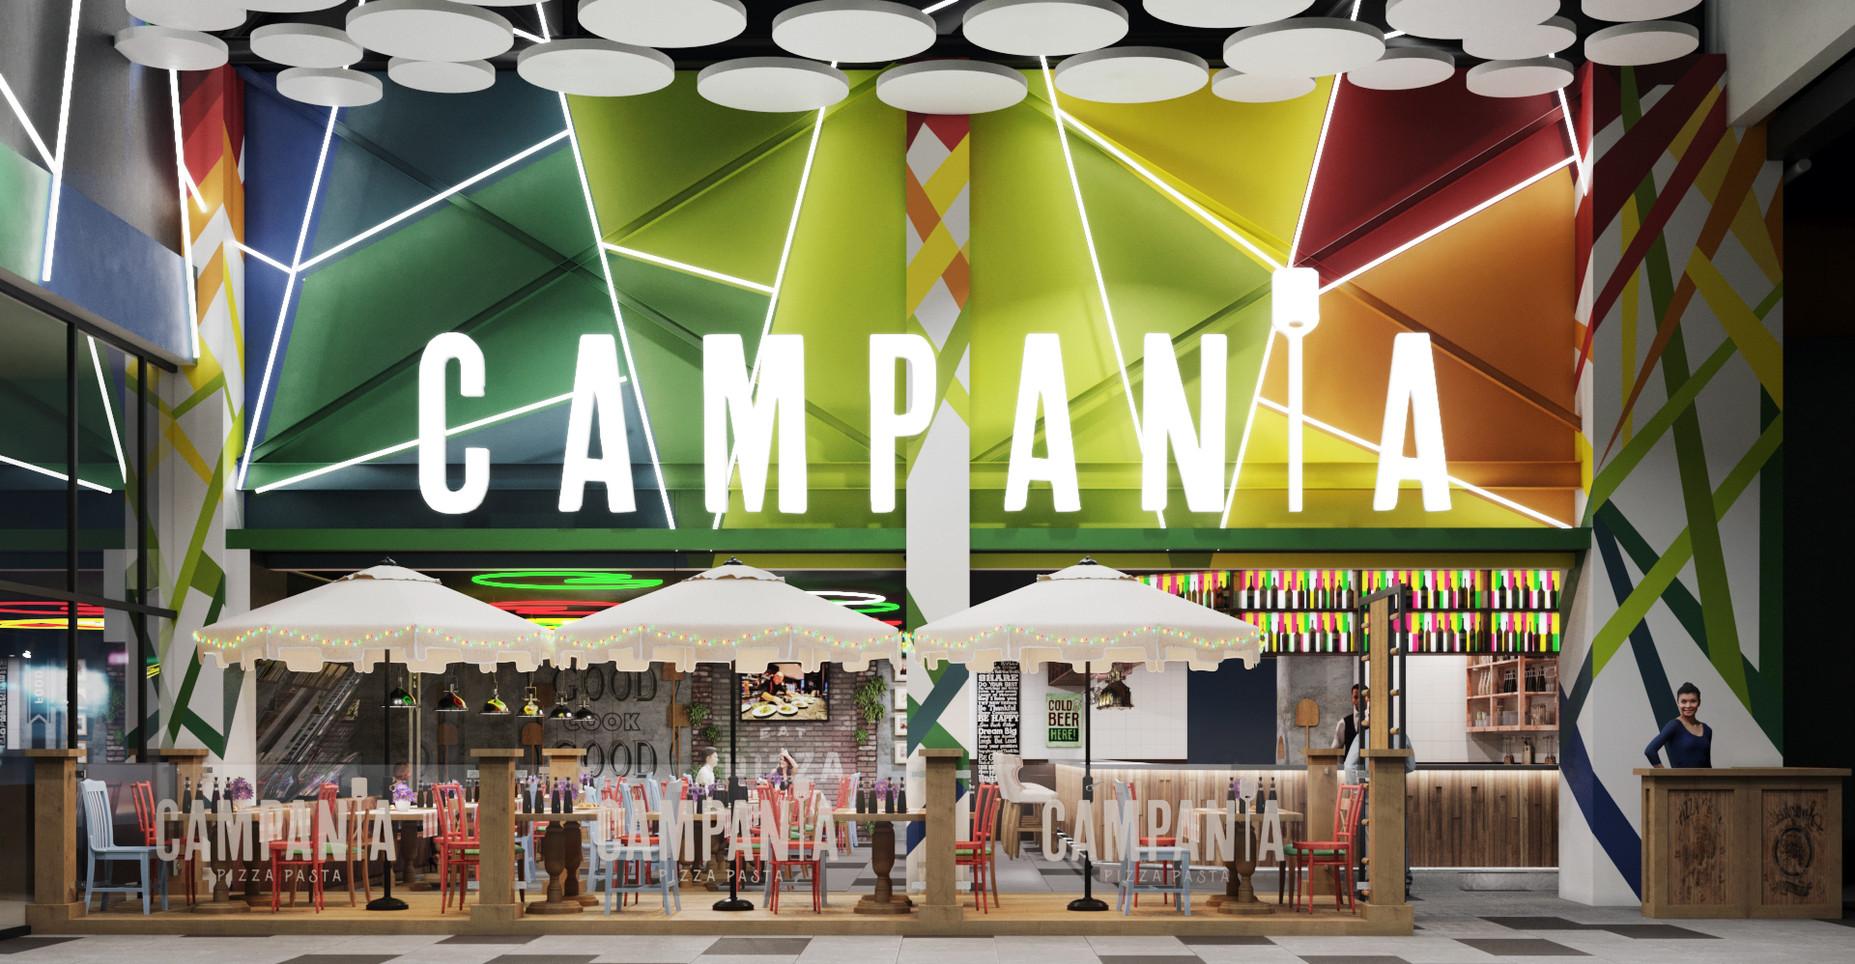 дизайн-проект интерьера пиццерии CAMPANIA